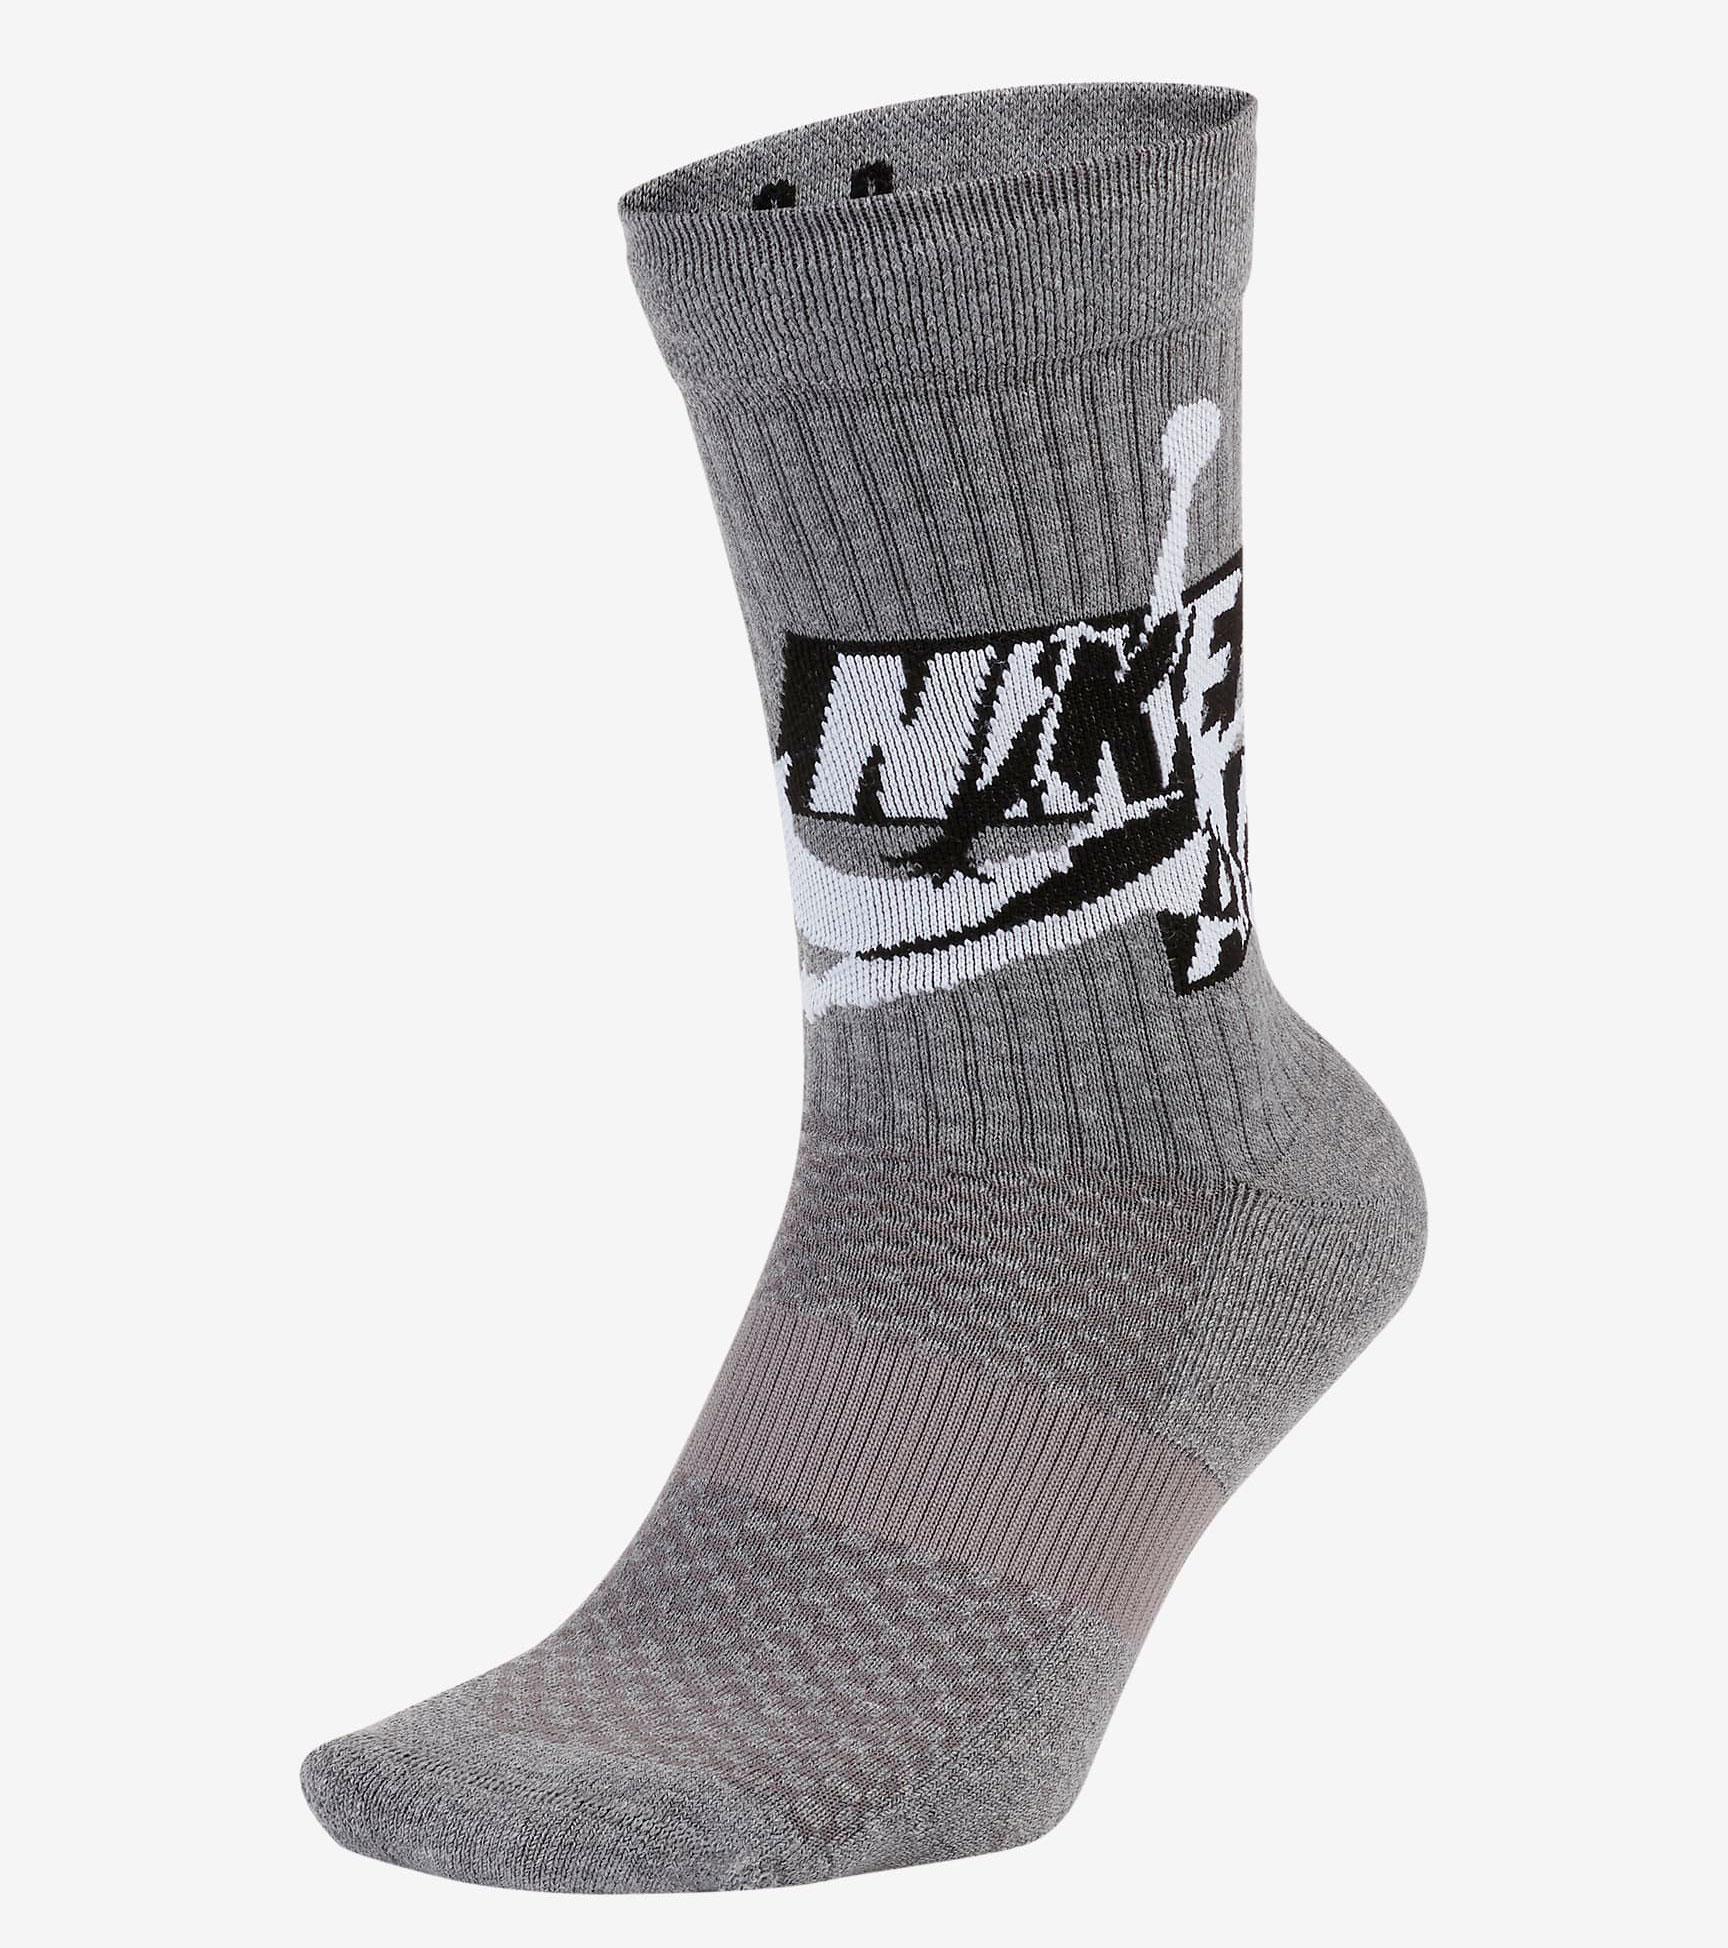 air-jordan-3-blue-cement-shirts-socks-match